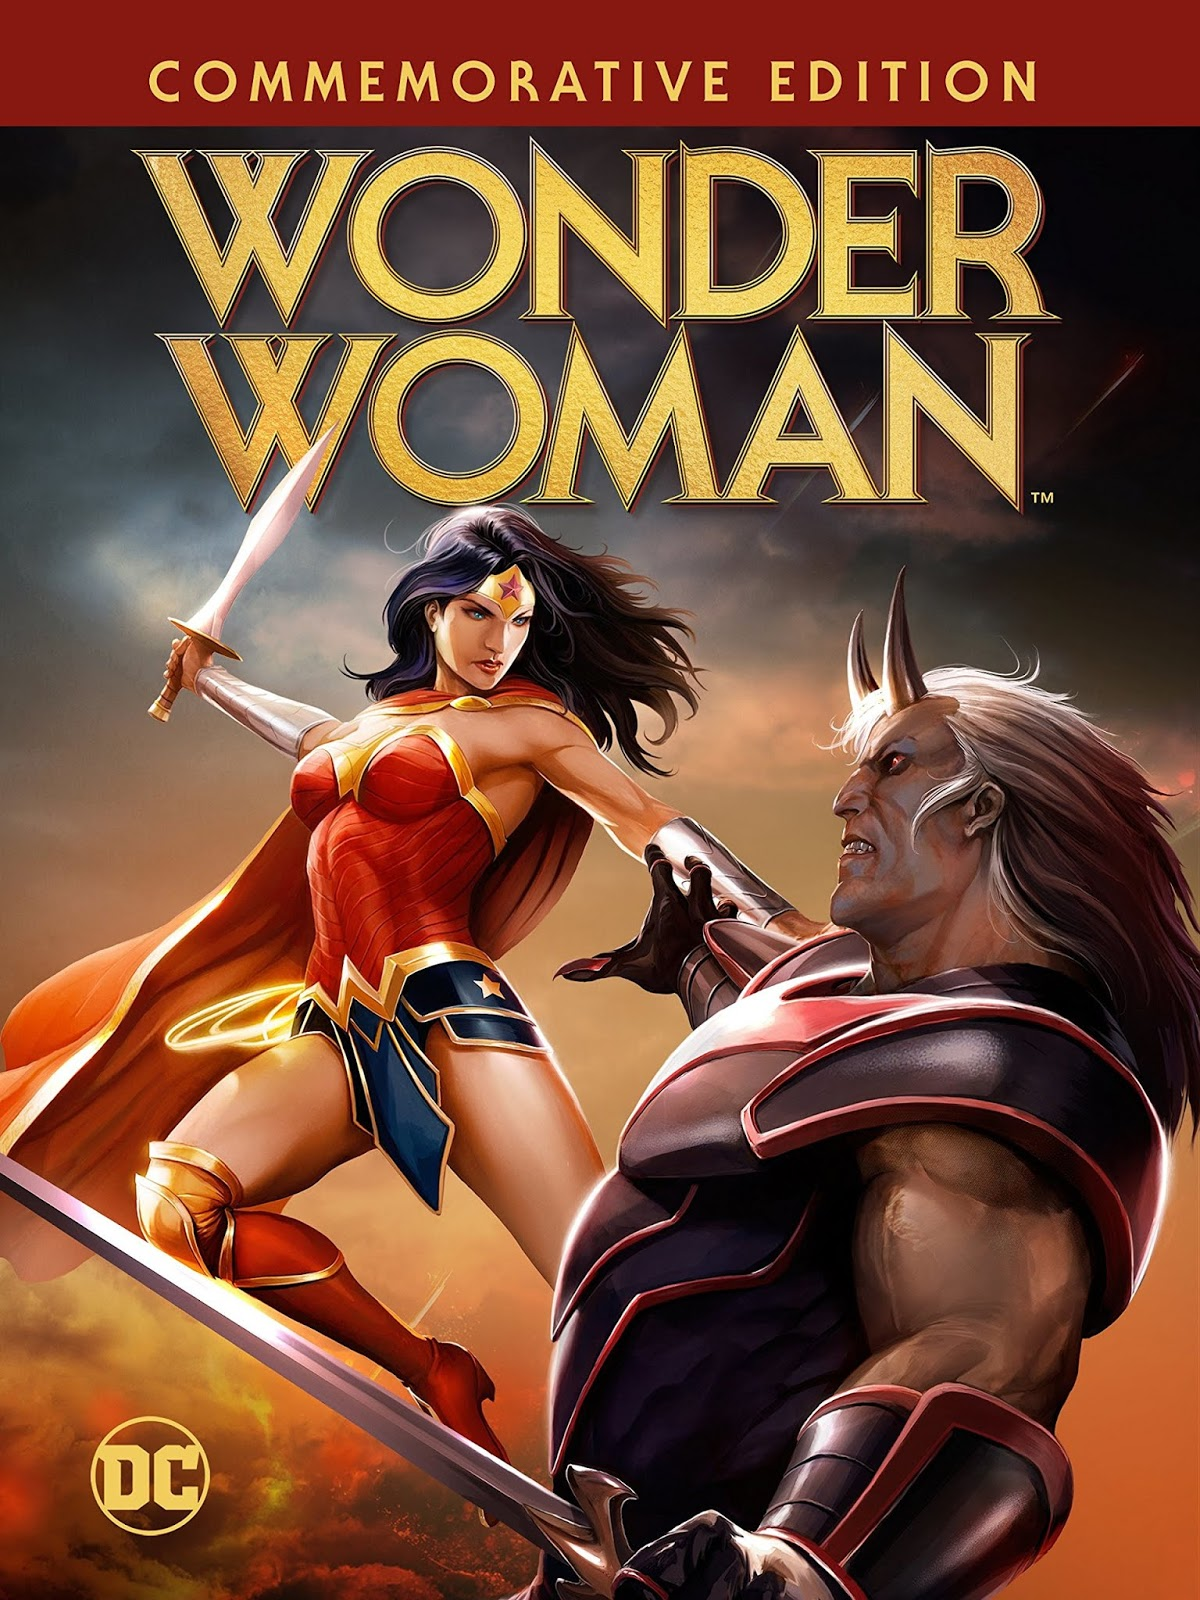 Wonder Woman: Commemorative Edition (2017) วันเดอร์ วูแมน ฉบับย้อนรำลึกสาวน้อยมหัศจรรย์